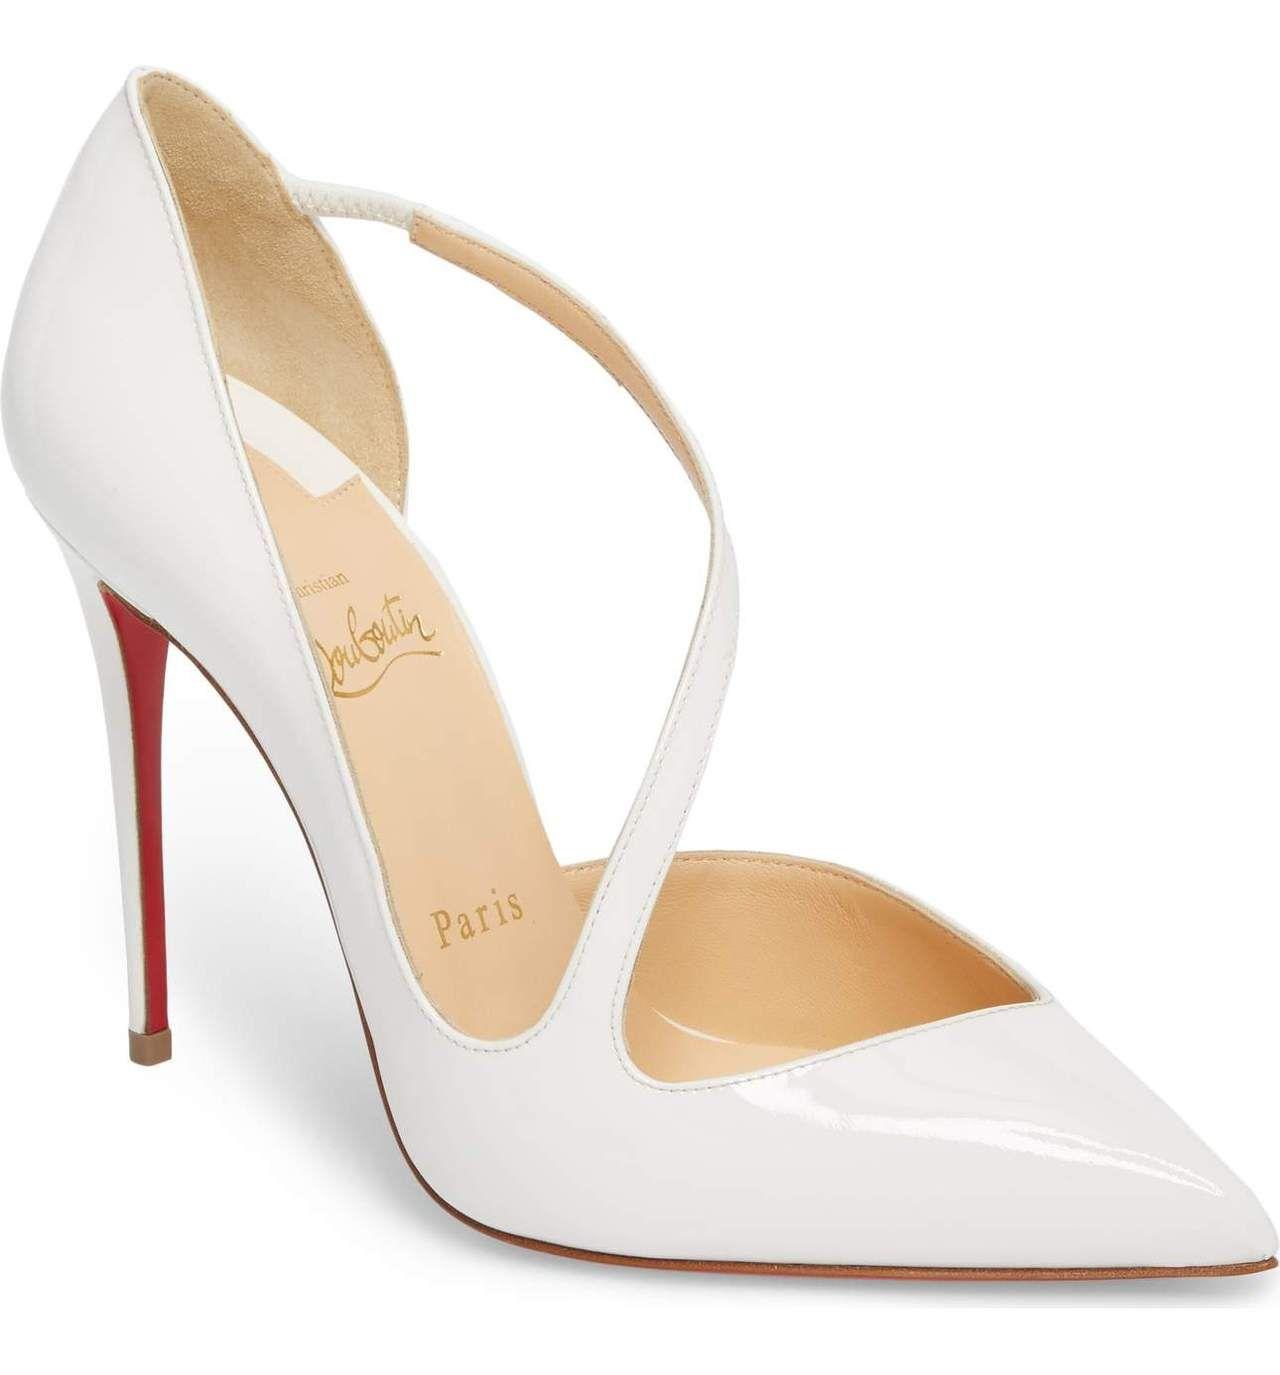 Bridal Shoes Saks: Pin On Bridal Shoes